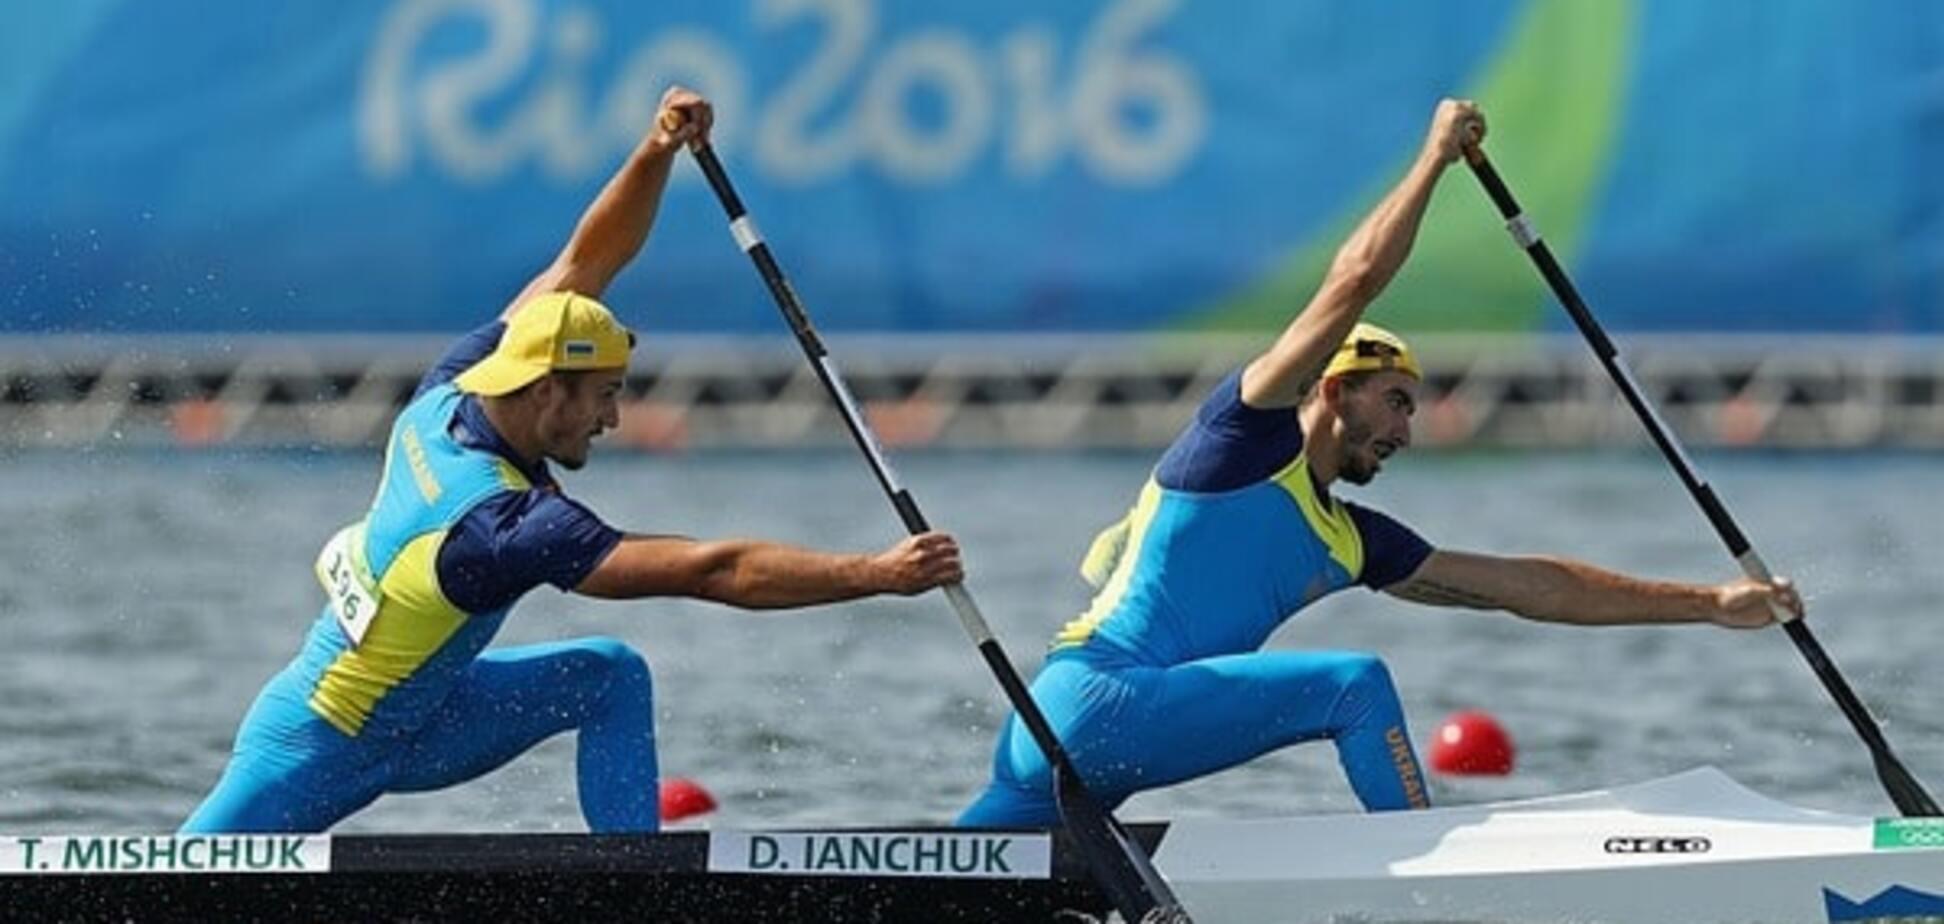 Дмитрий Янчук и Тарас Мищук